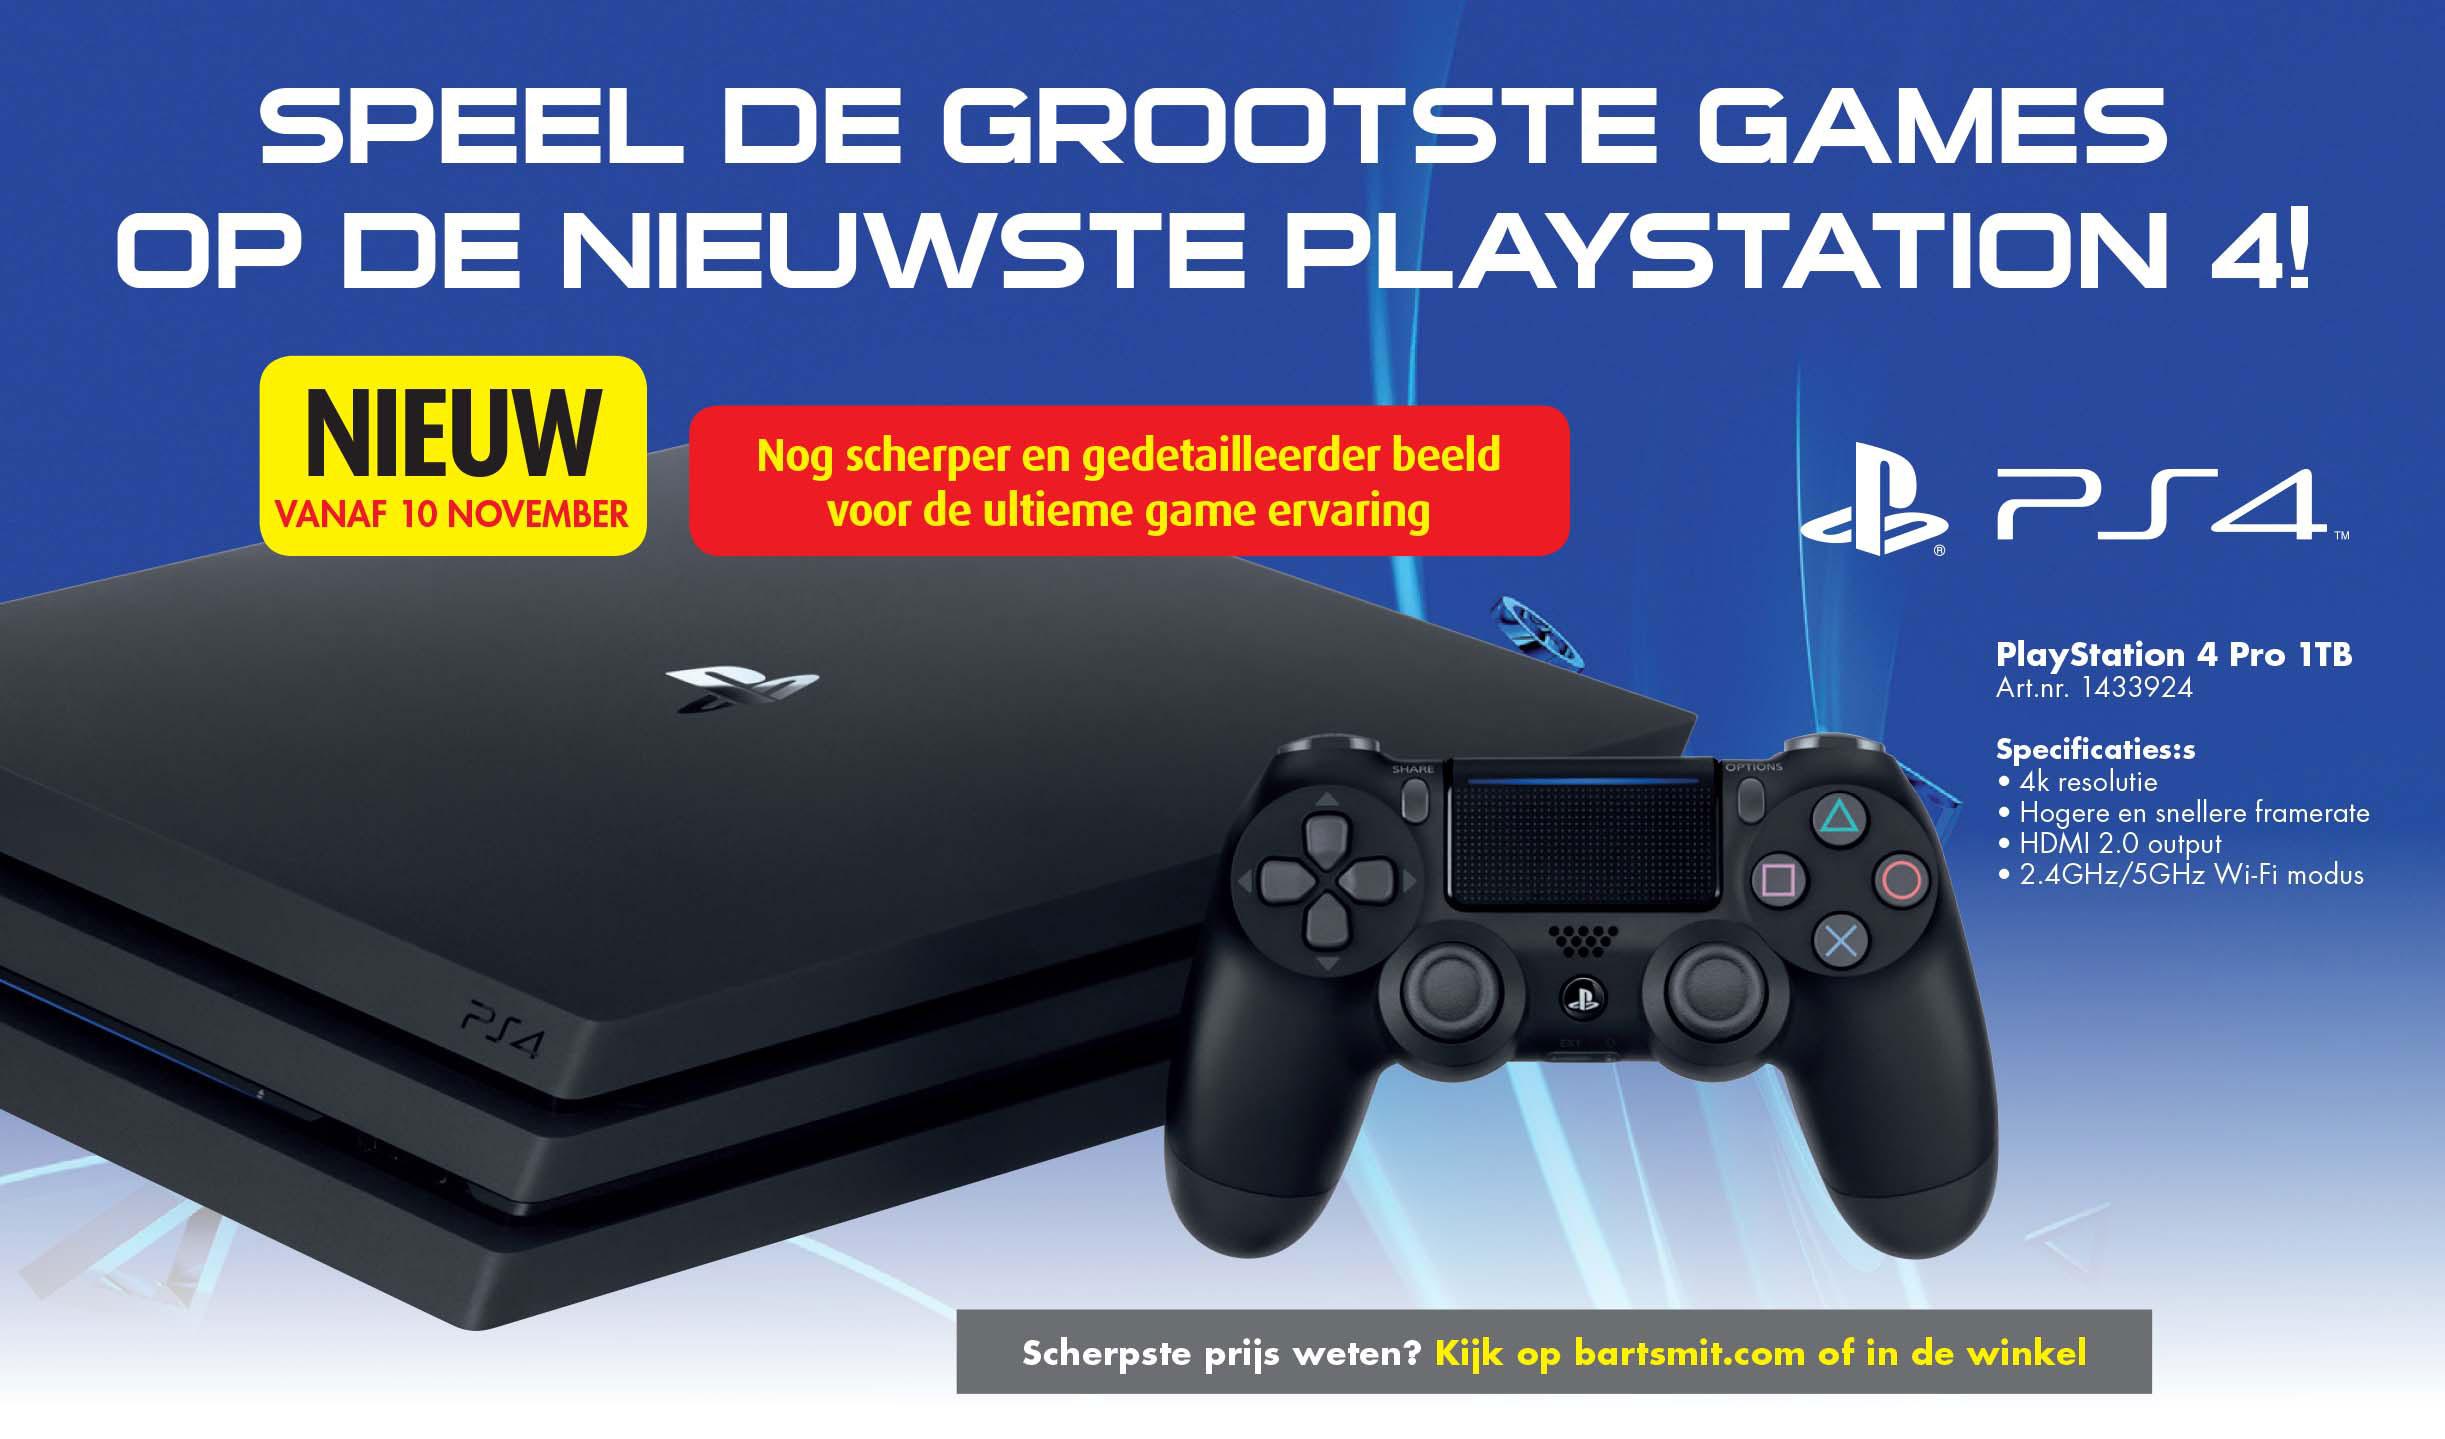 Bart Smit Playstation 4 Pro 1 TB